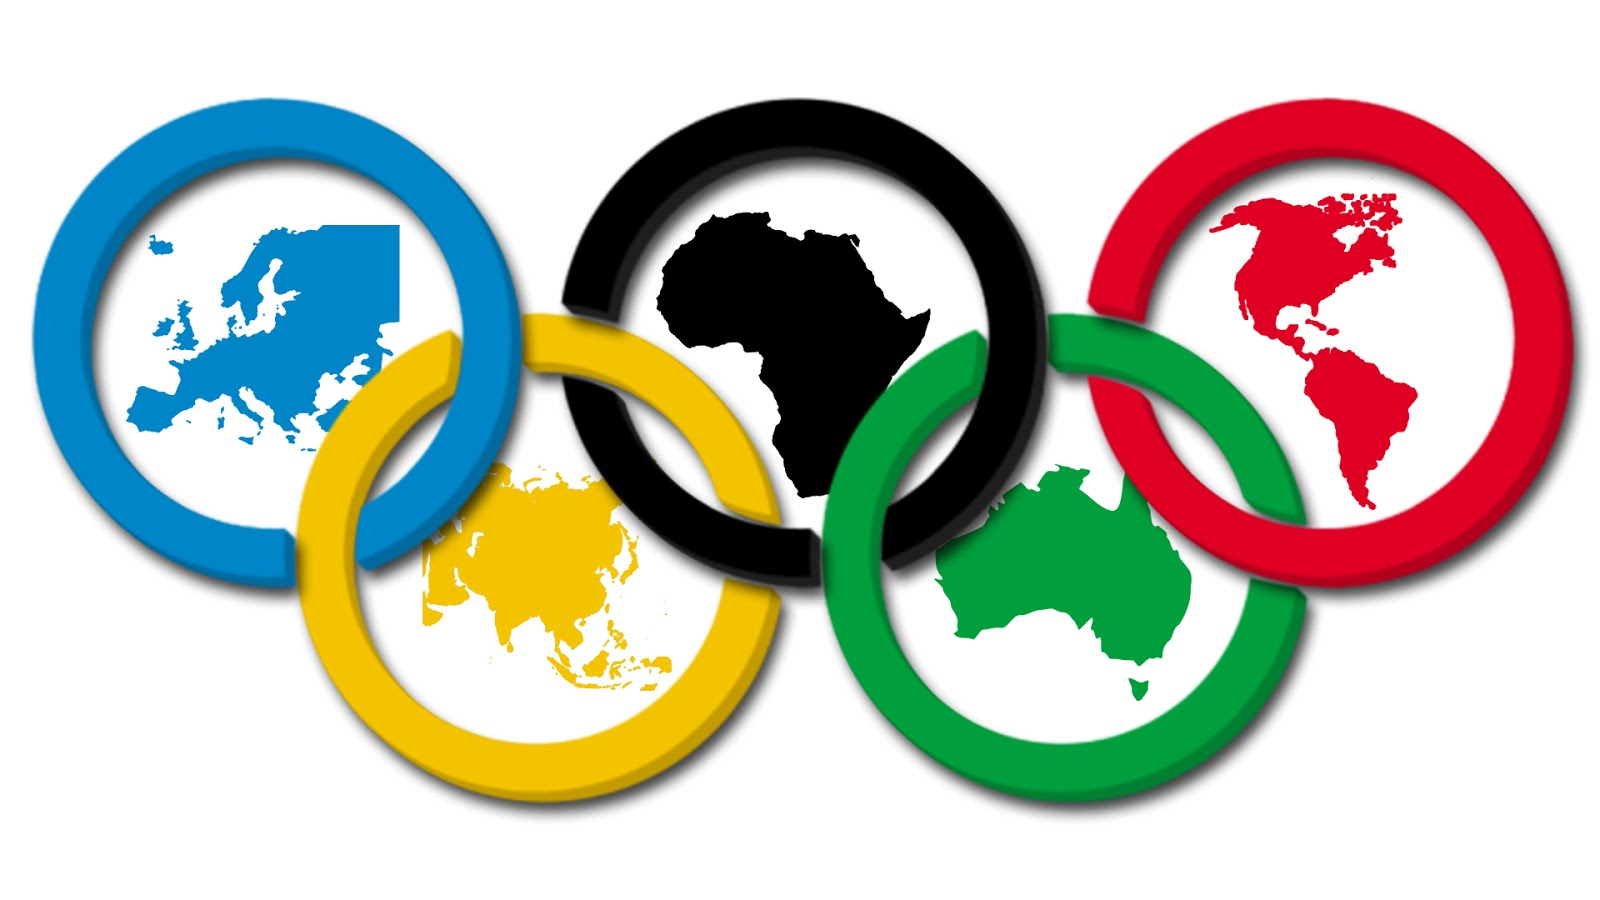 Lista De Atividades Sobres Os Jogos Olimpicos So Escola